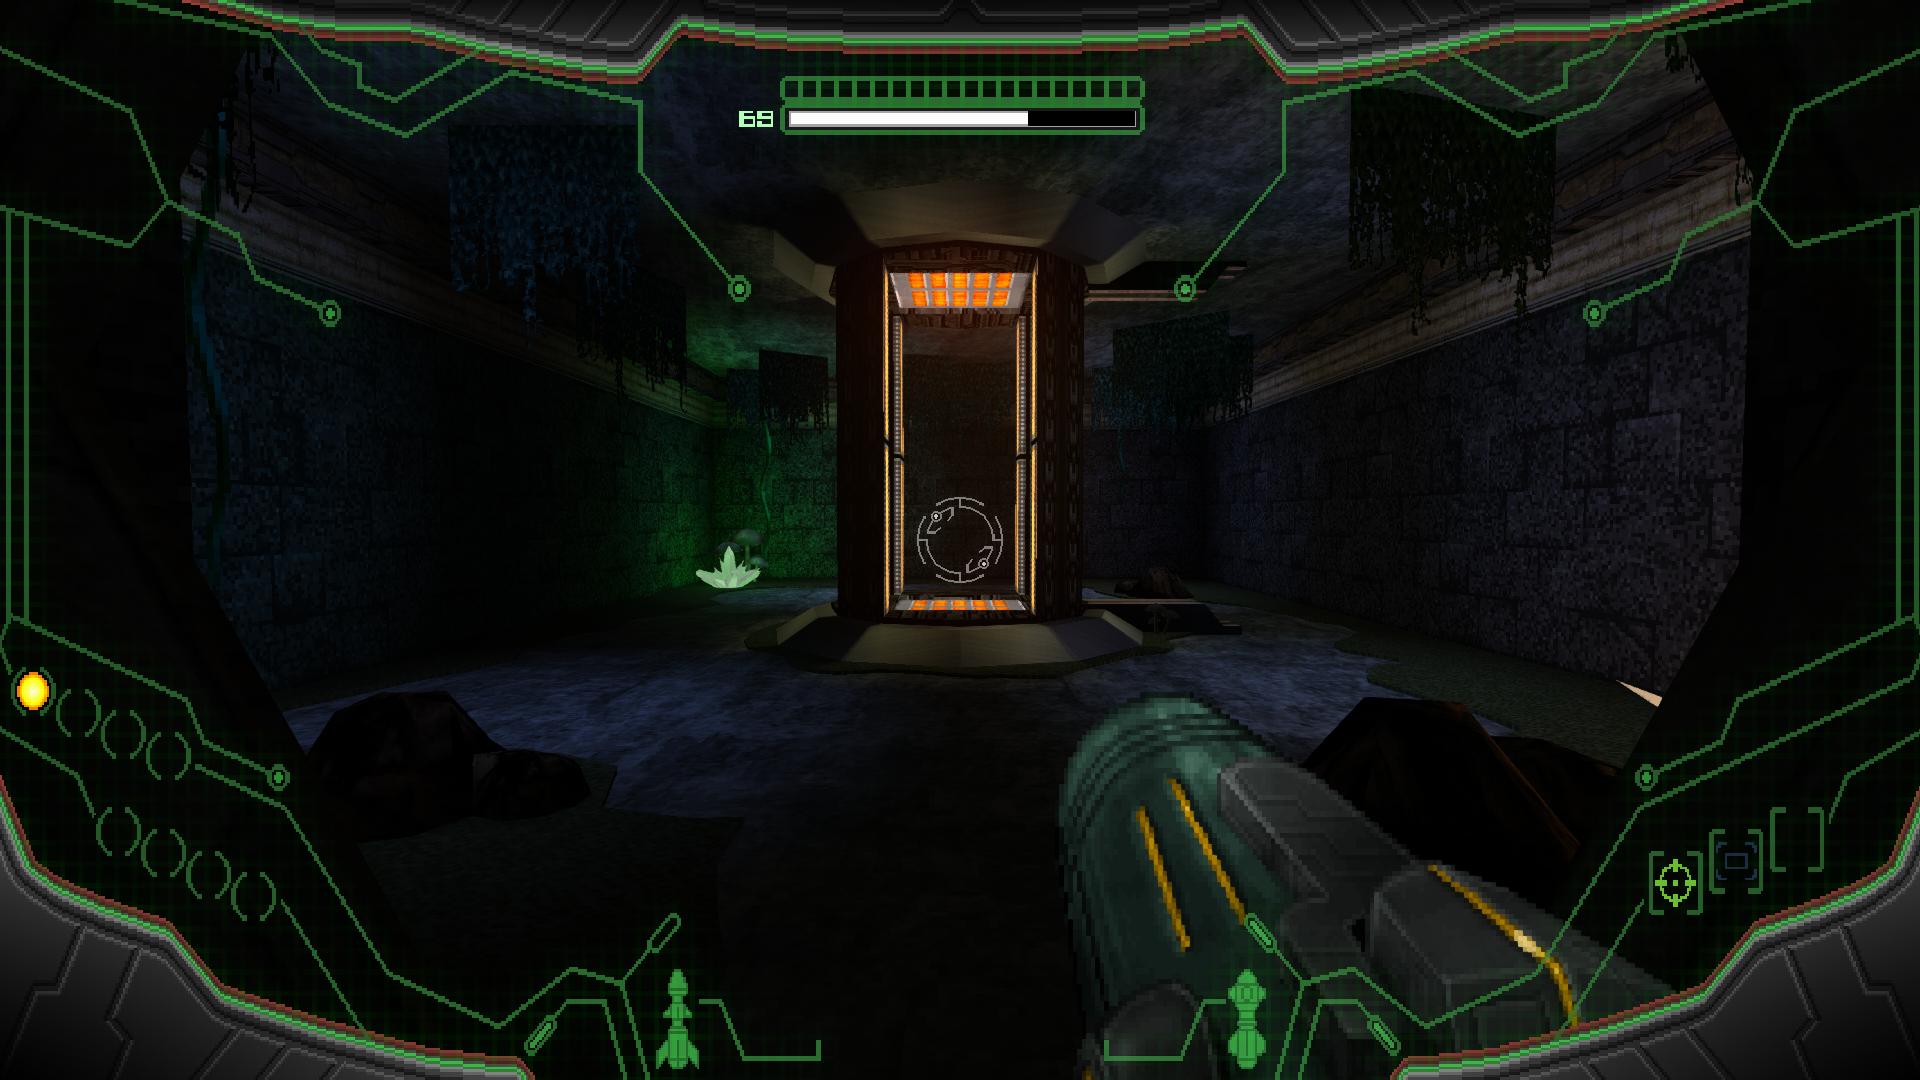 Screenshot_Doom_20210523_011504.png.b4e8c91dacb6a8f4c650589aba26d672.png